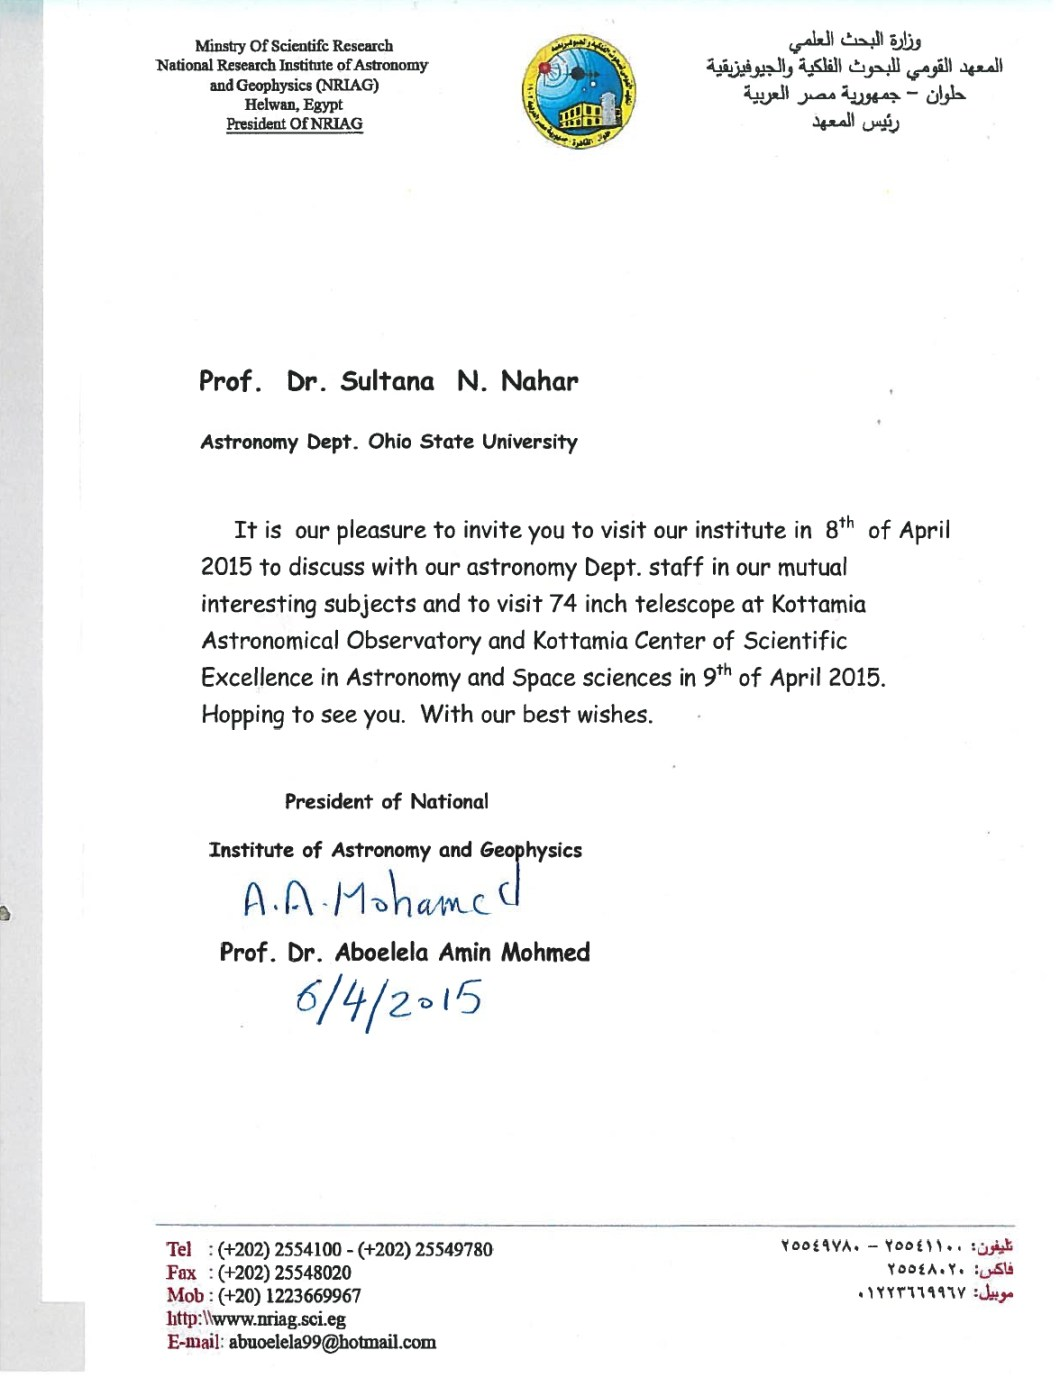 Visiting scholar invitation letter sample invitationjdi 786 stopboris Choice Image